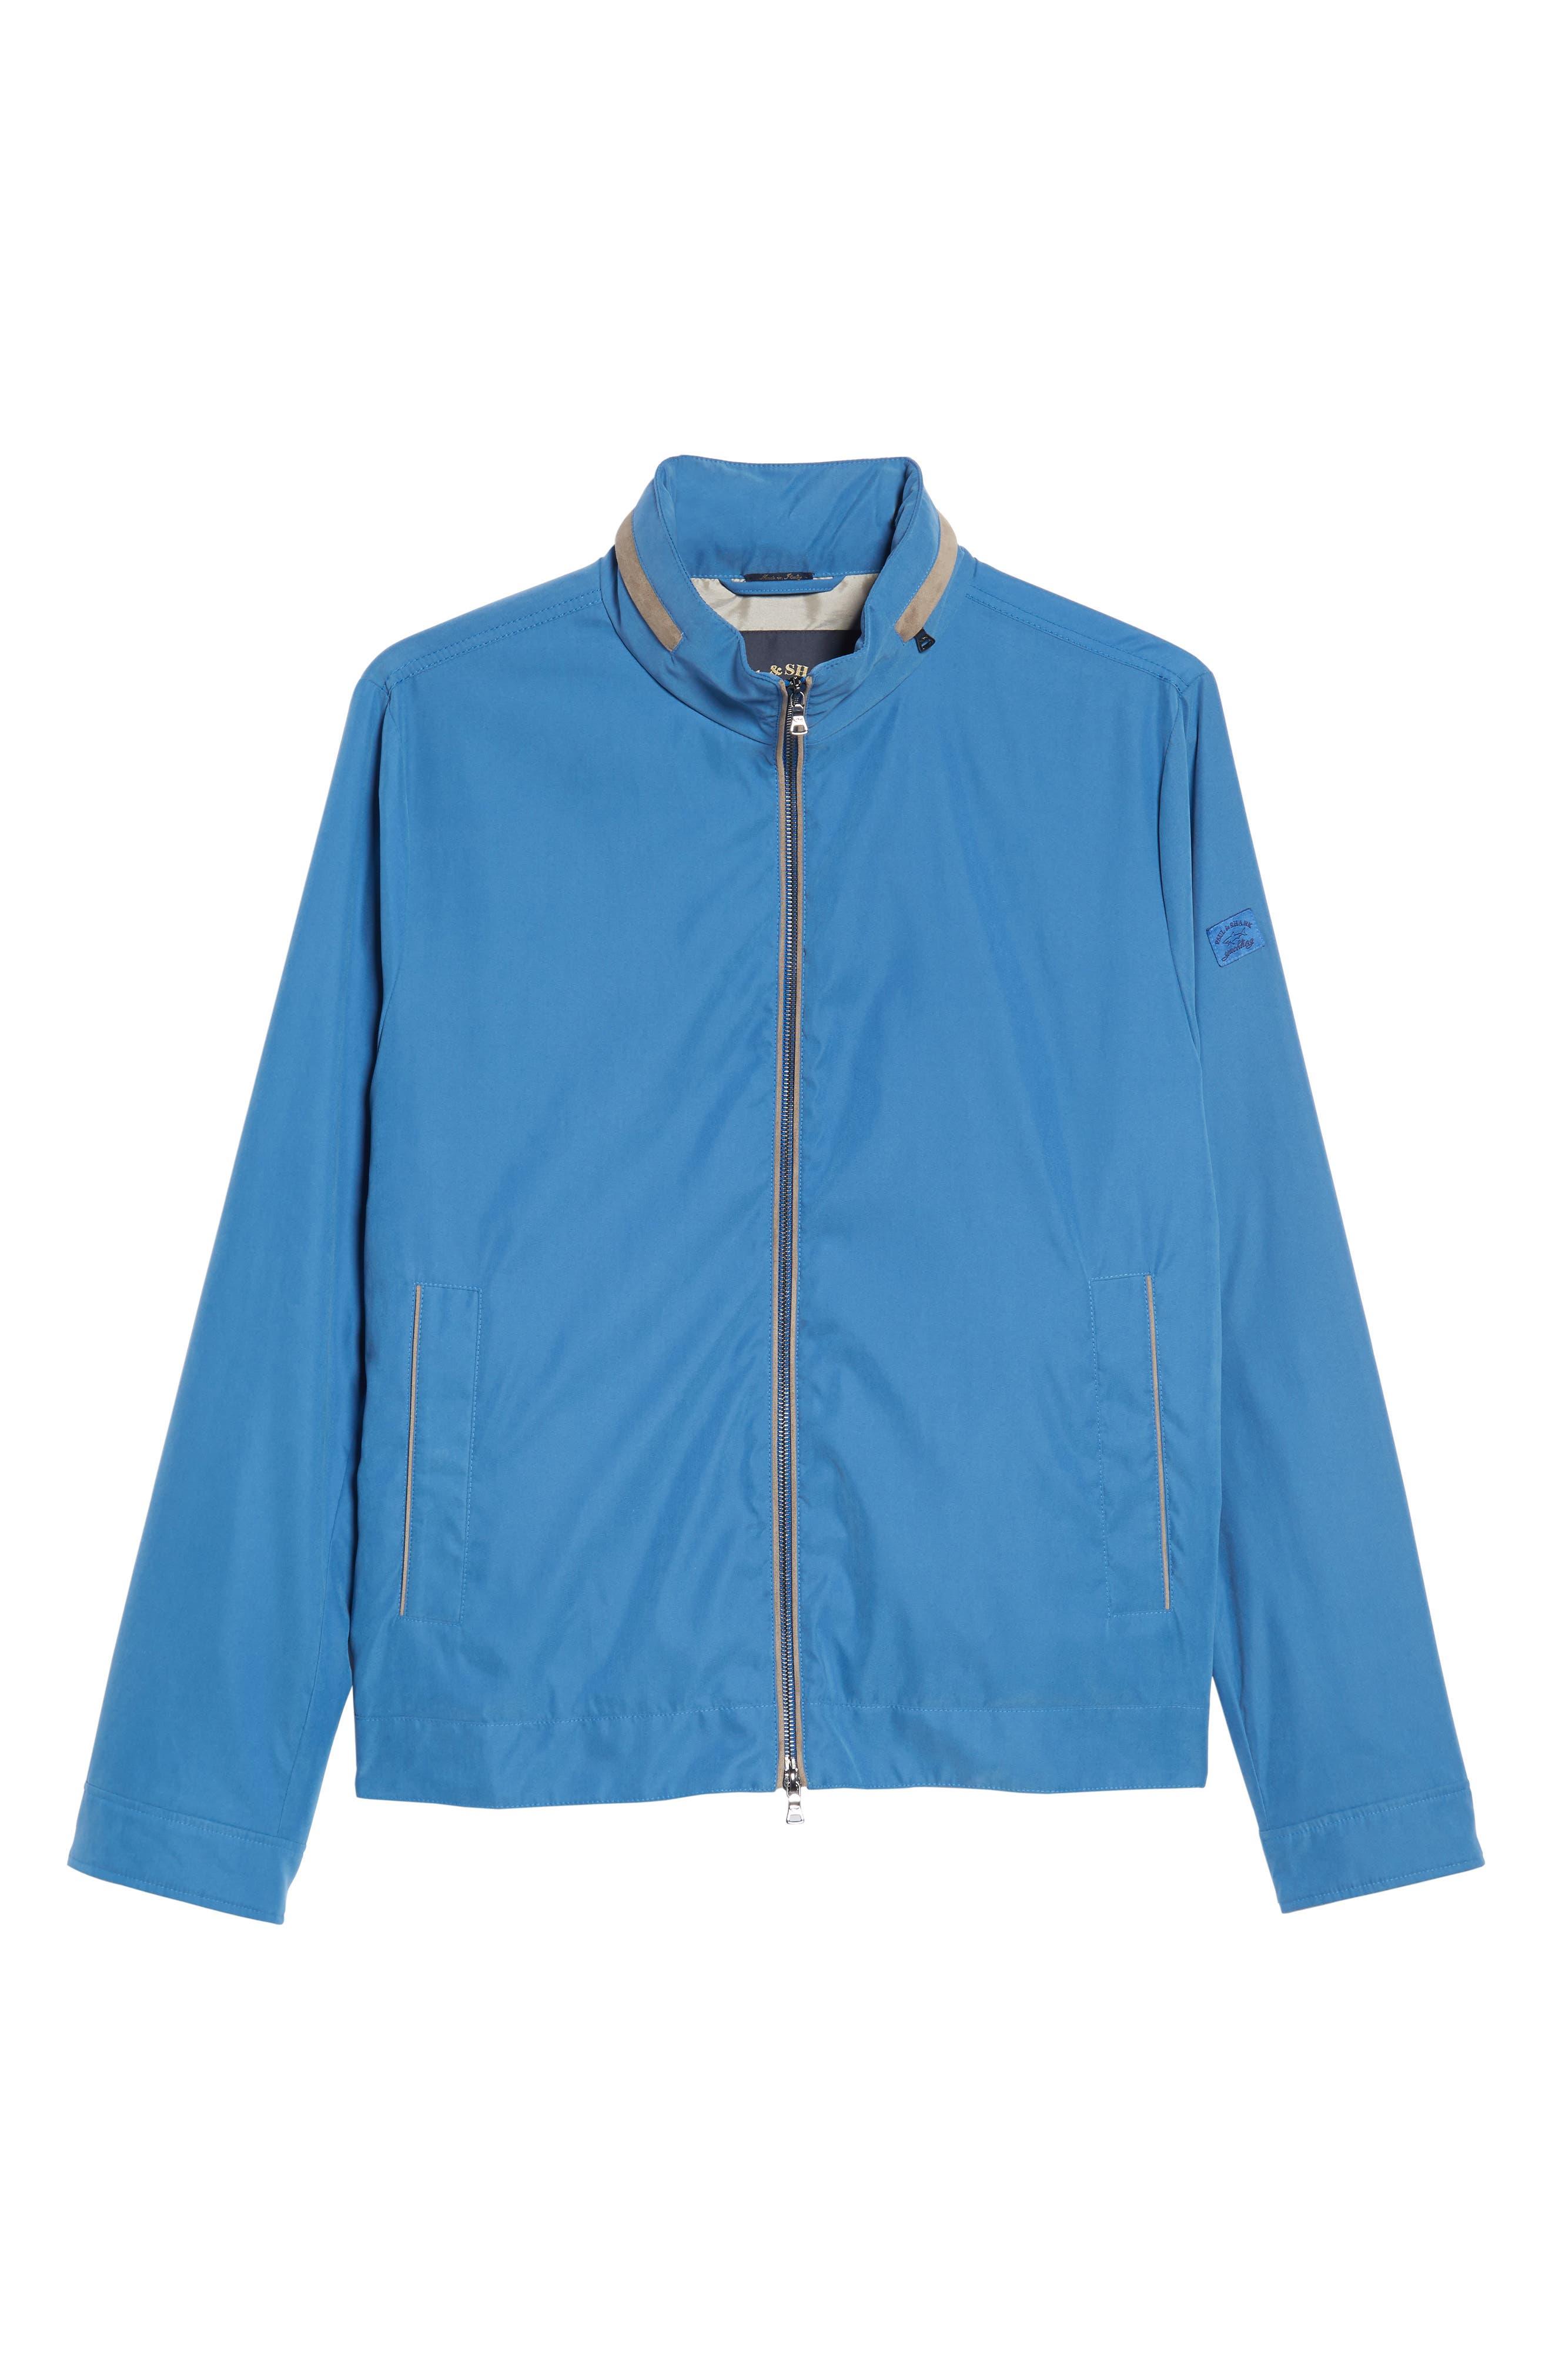 Paul&Shark Water Repellent Microfiber Jacket,                             Alternate thumbnail 6, color,                             Blue